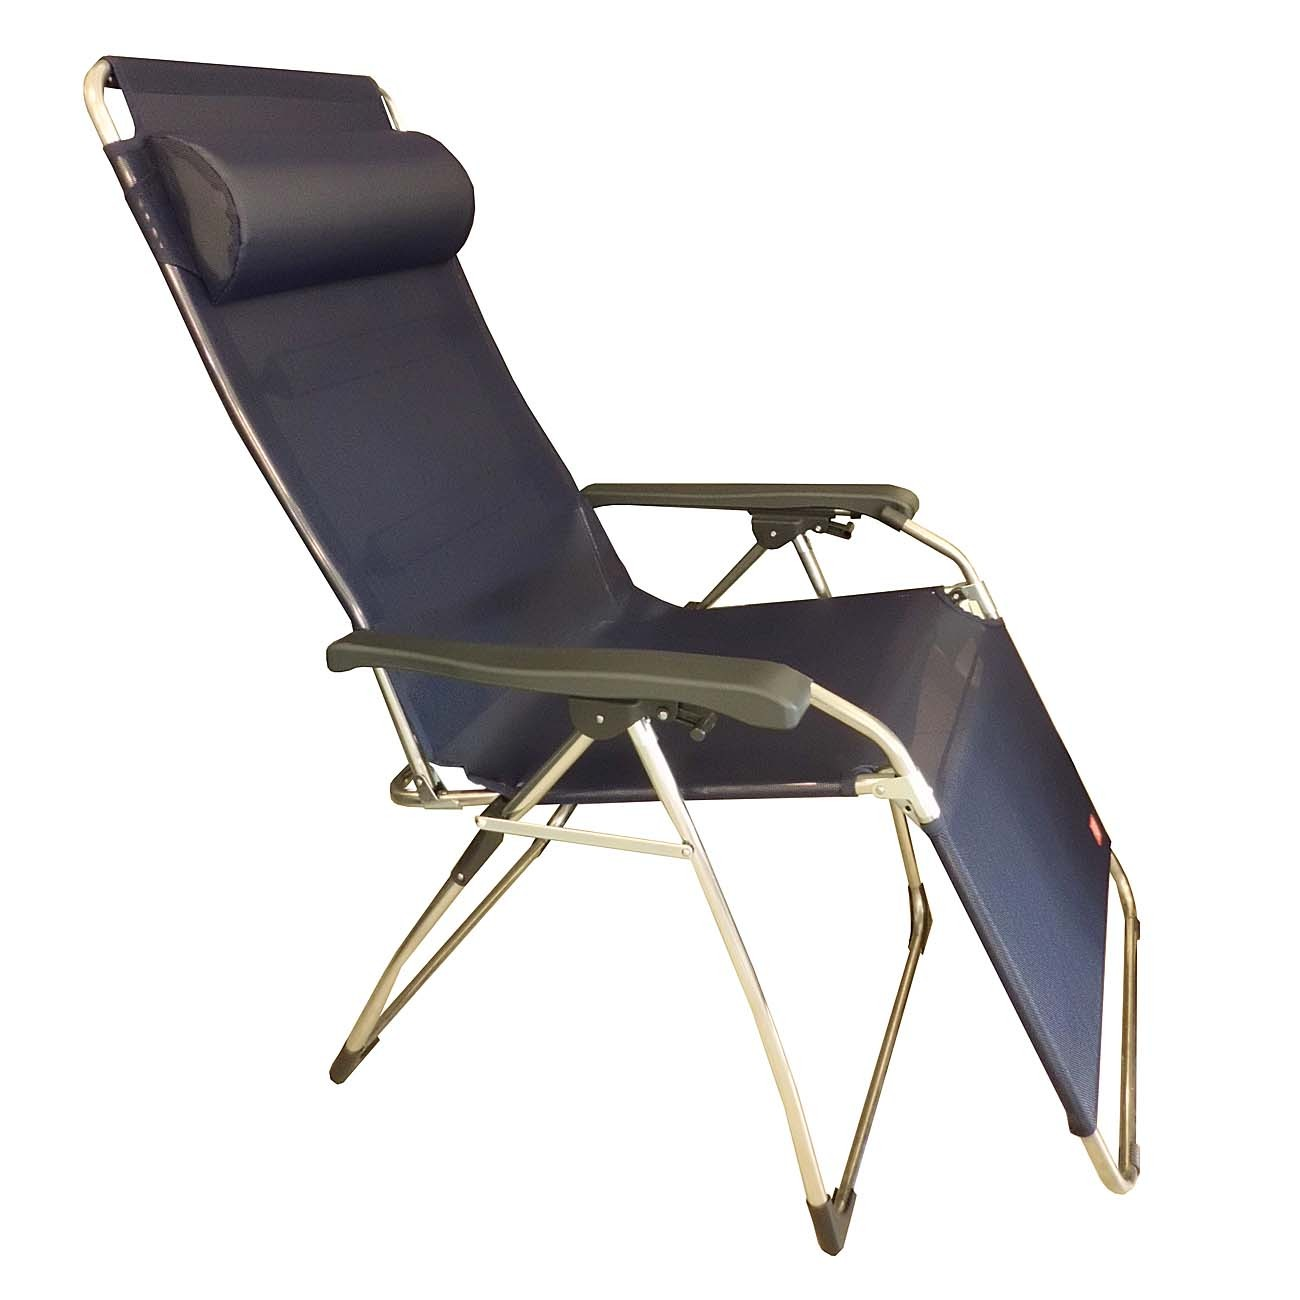 jan kurtz fiam amida xxl relaxliege liegestuhl dunkelblau. Black Bedroom Furniture Sets. Home Design Ideas